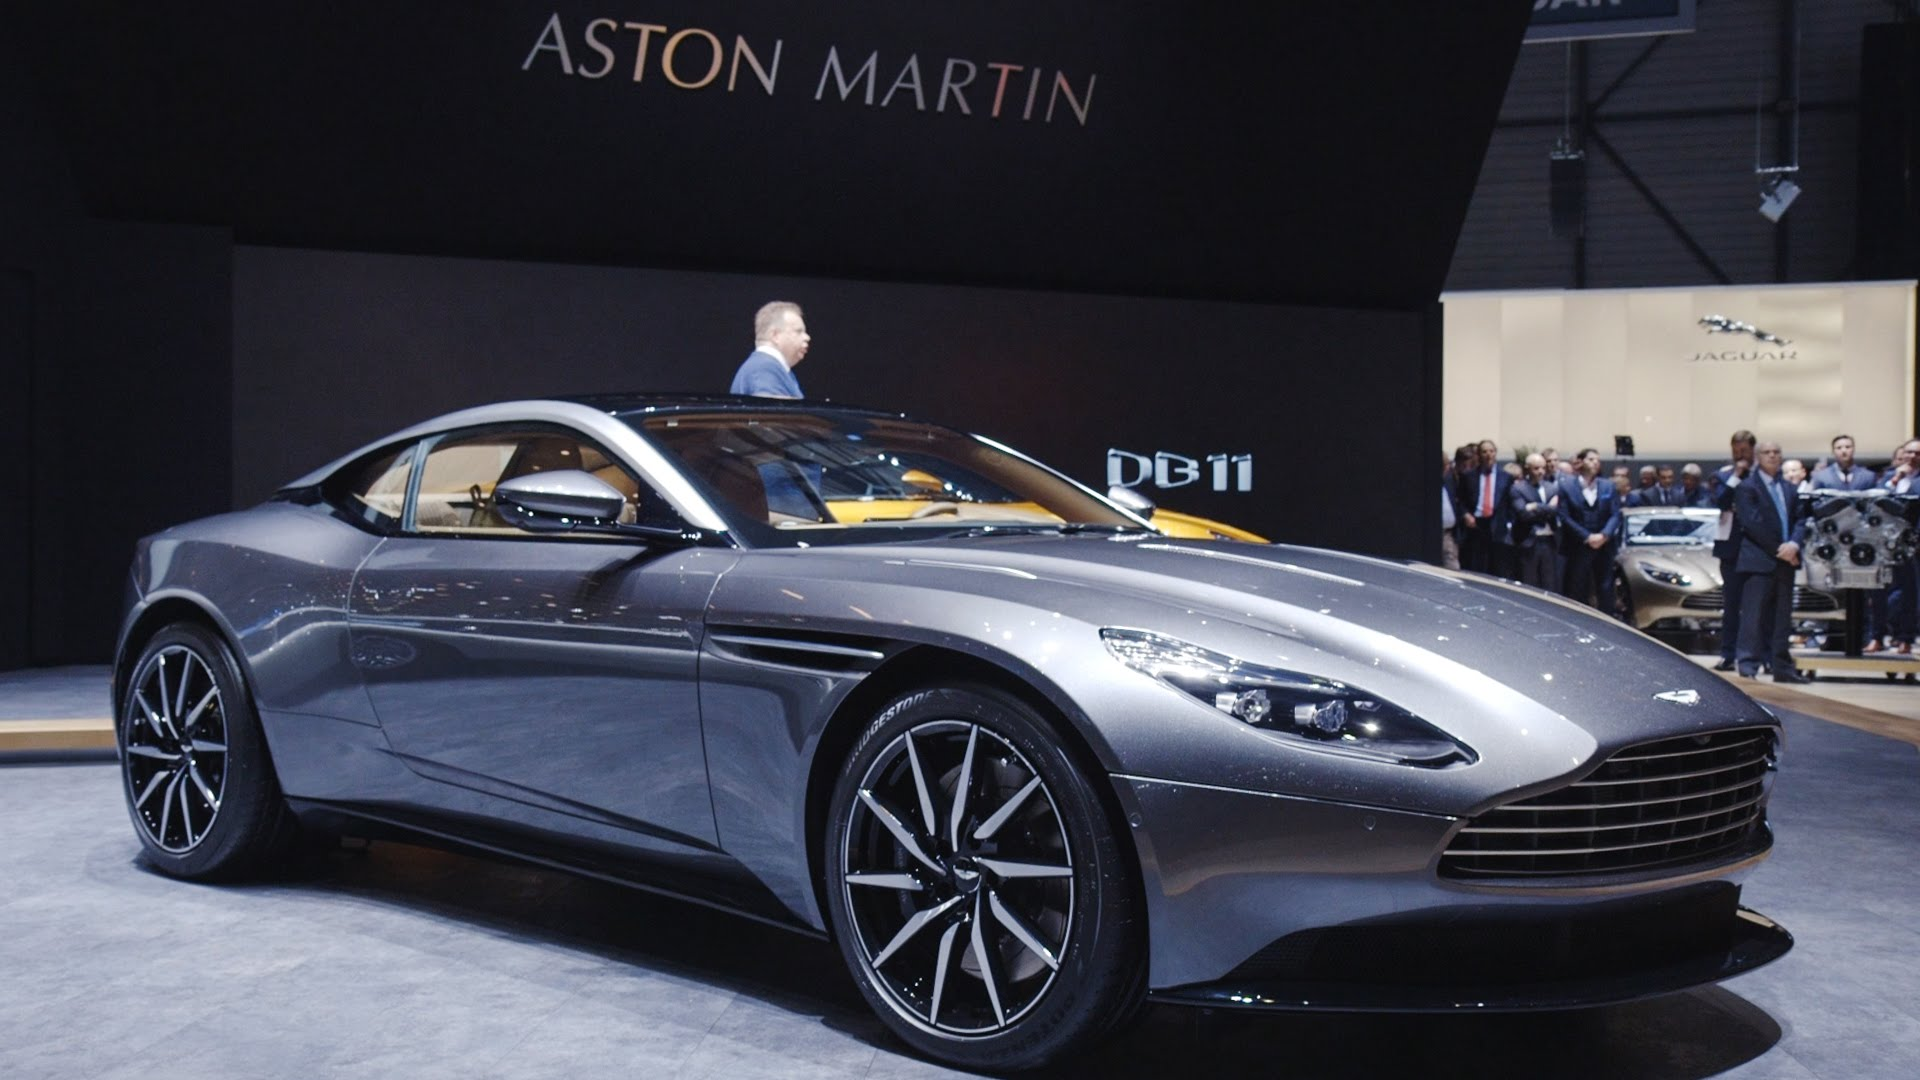 Aston Martin Db11 Hd Wallpapers 7wallpapersnet